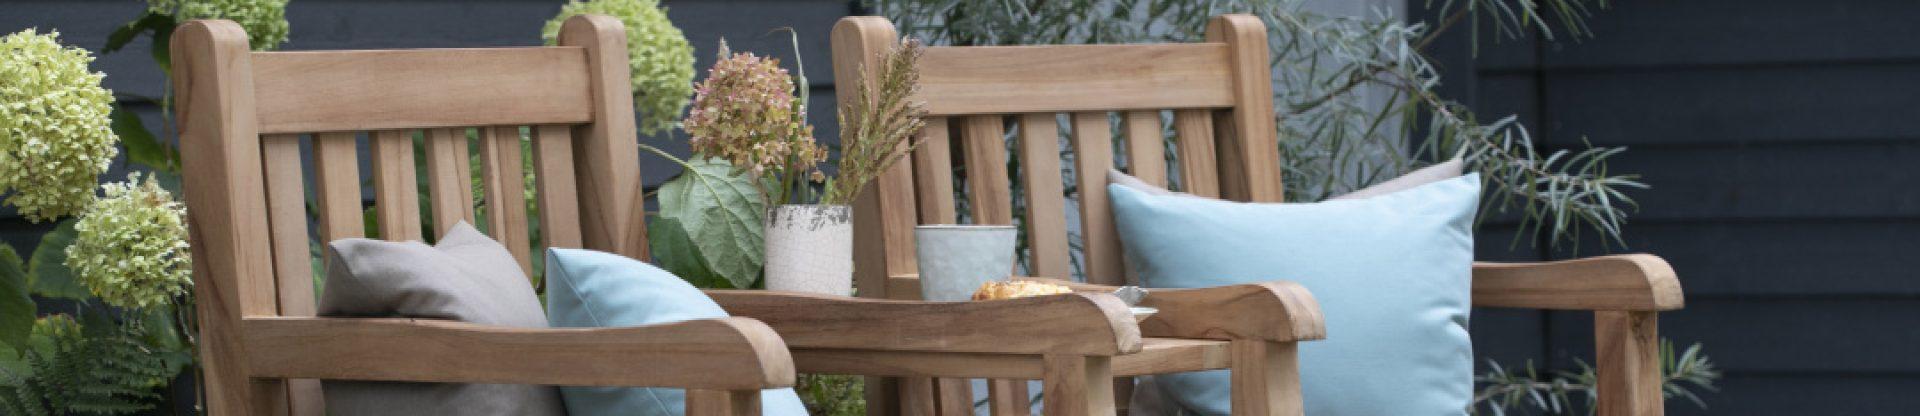 Bene Living Gartenmöbel